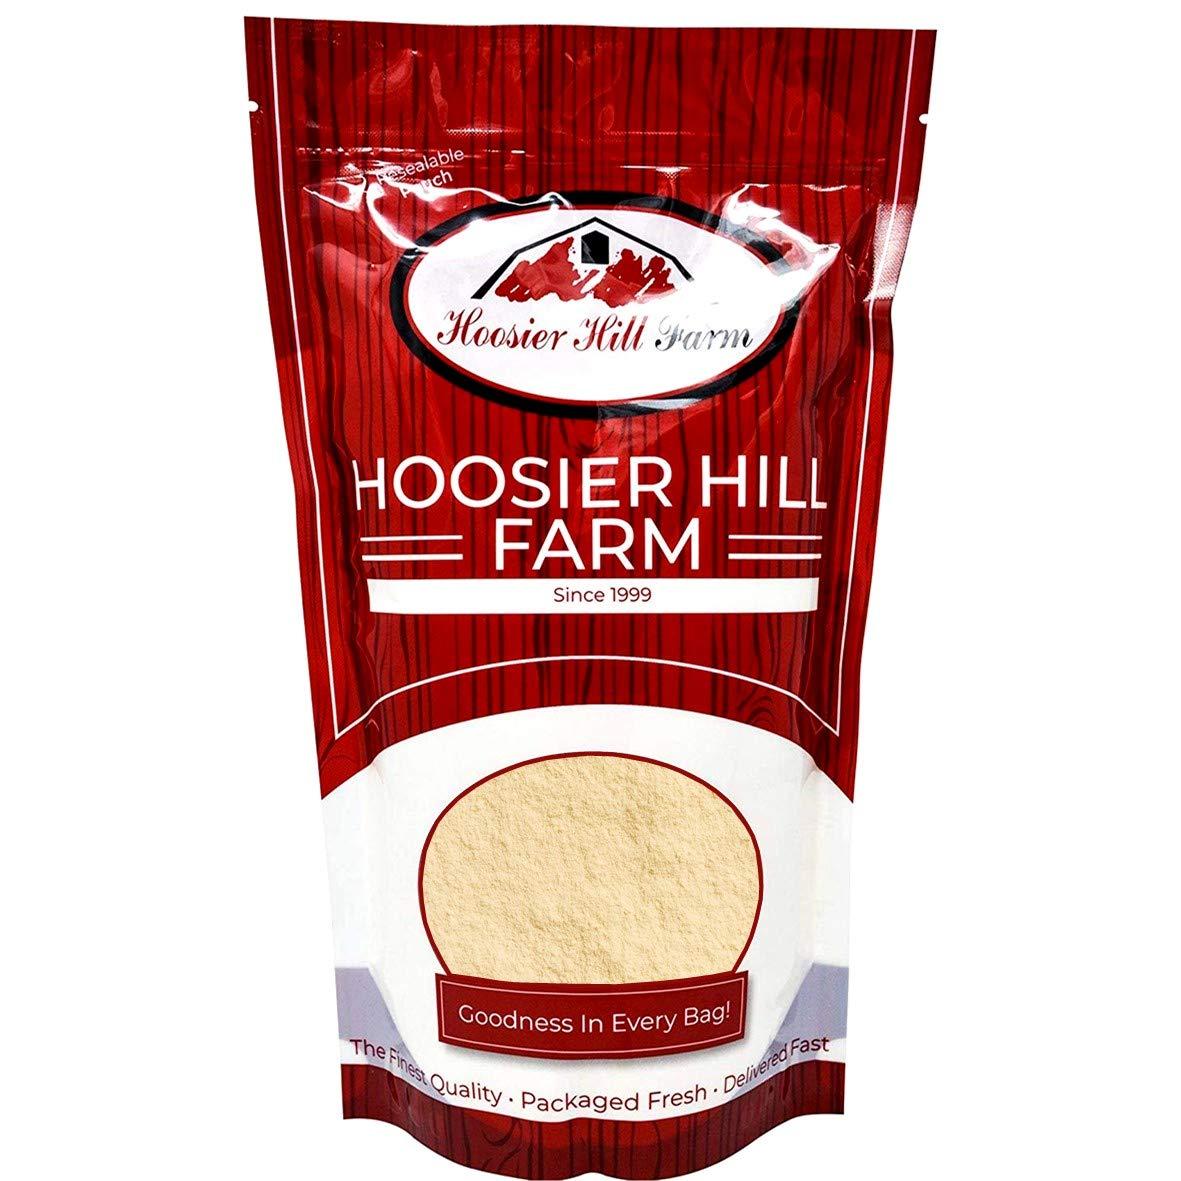 Soy Lecithin Powder (250g) Pure Non-GMO Deoiled Soybean Lecithin by Hoosier Hill Farm